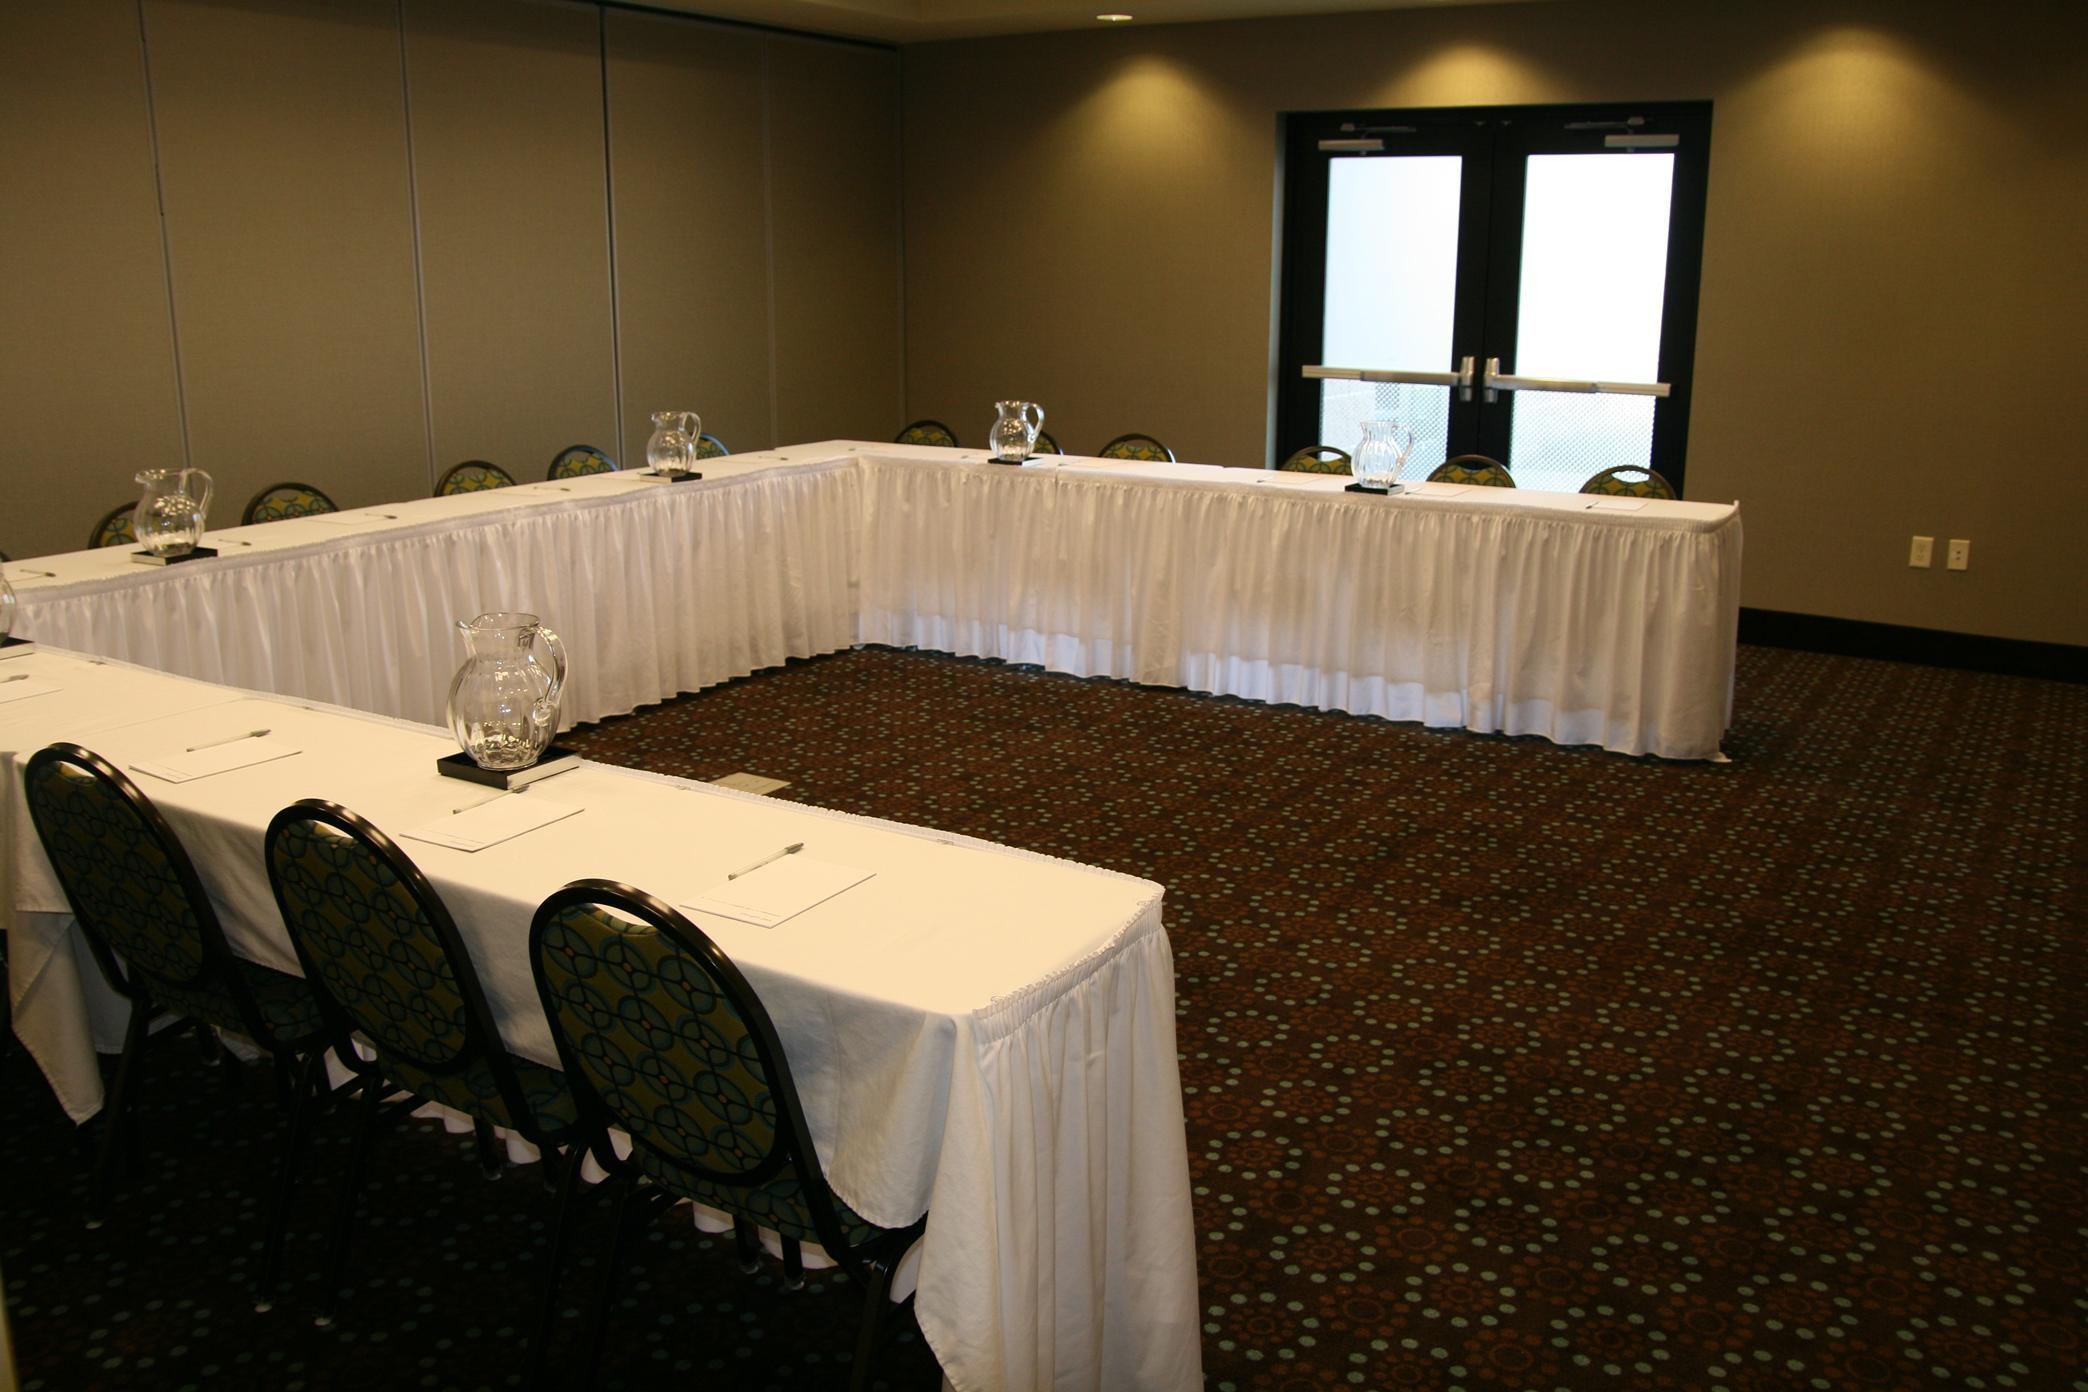 Half Room U-Shaped Meeting Room